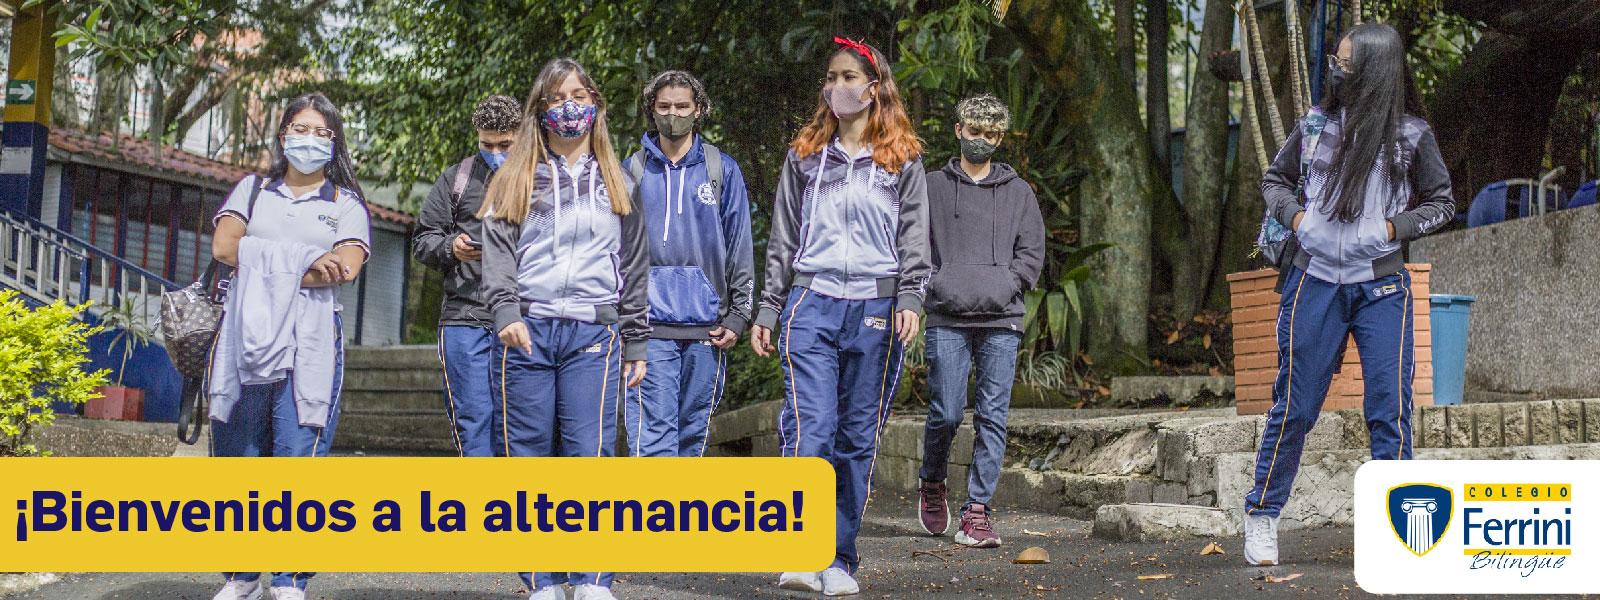 Manual de Convivencia Colegio Ferrini bilingüe